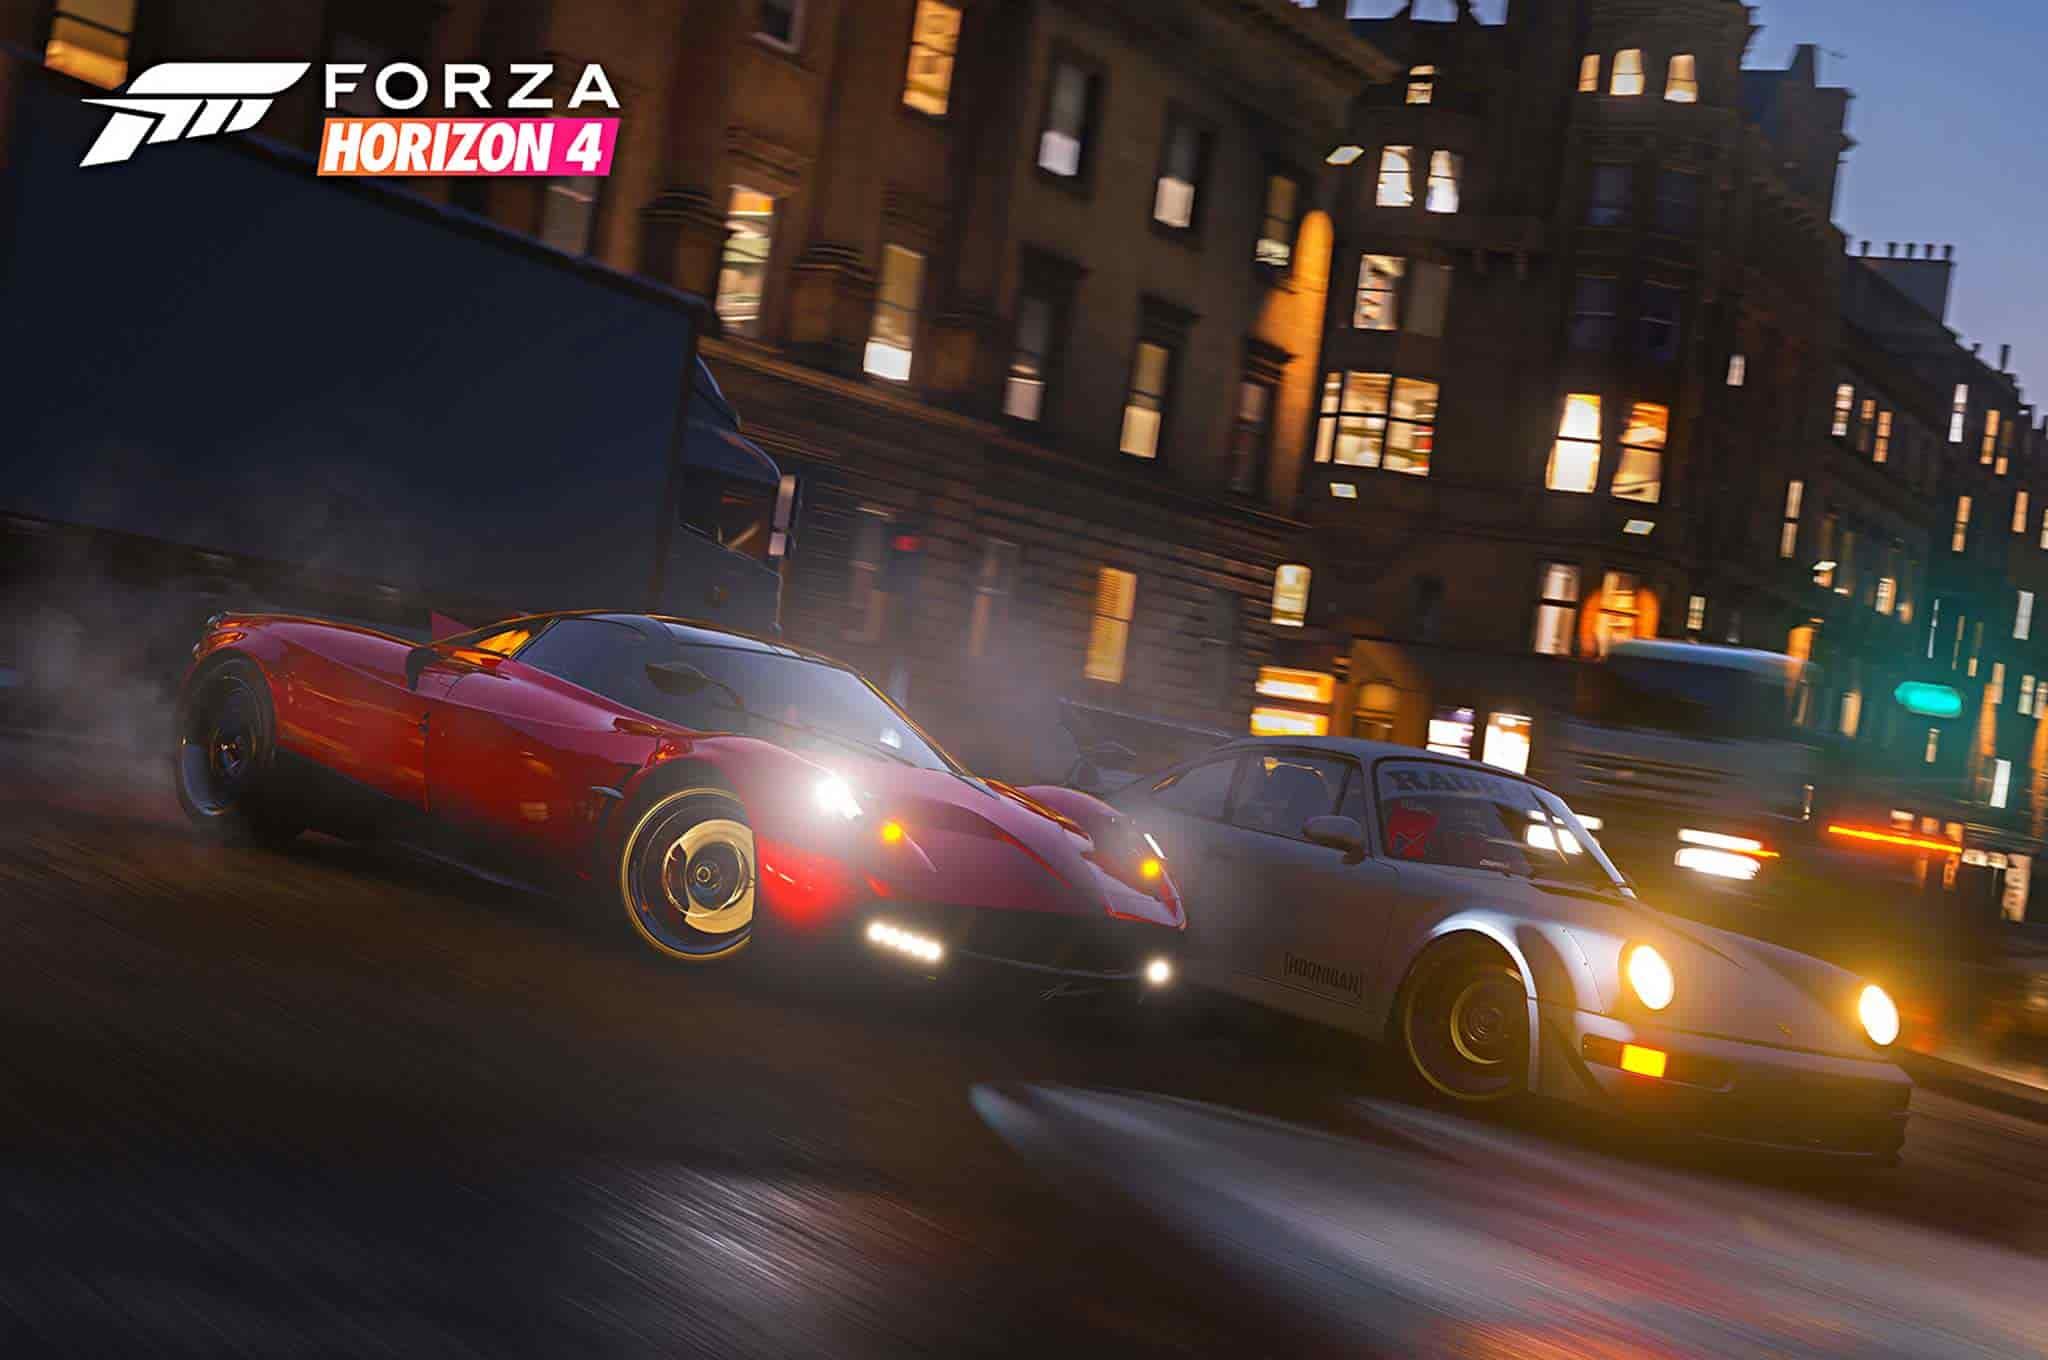 Forza Horizon 4 Japanese Heroes Car Pack (UK)|Xbox One| CDKeys